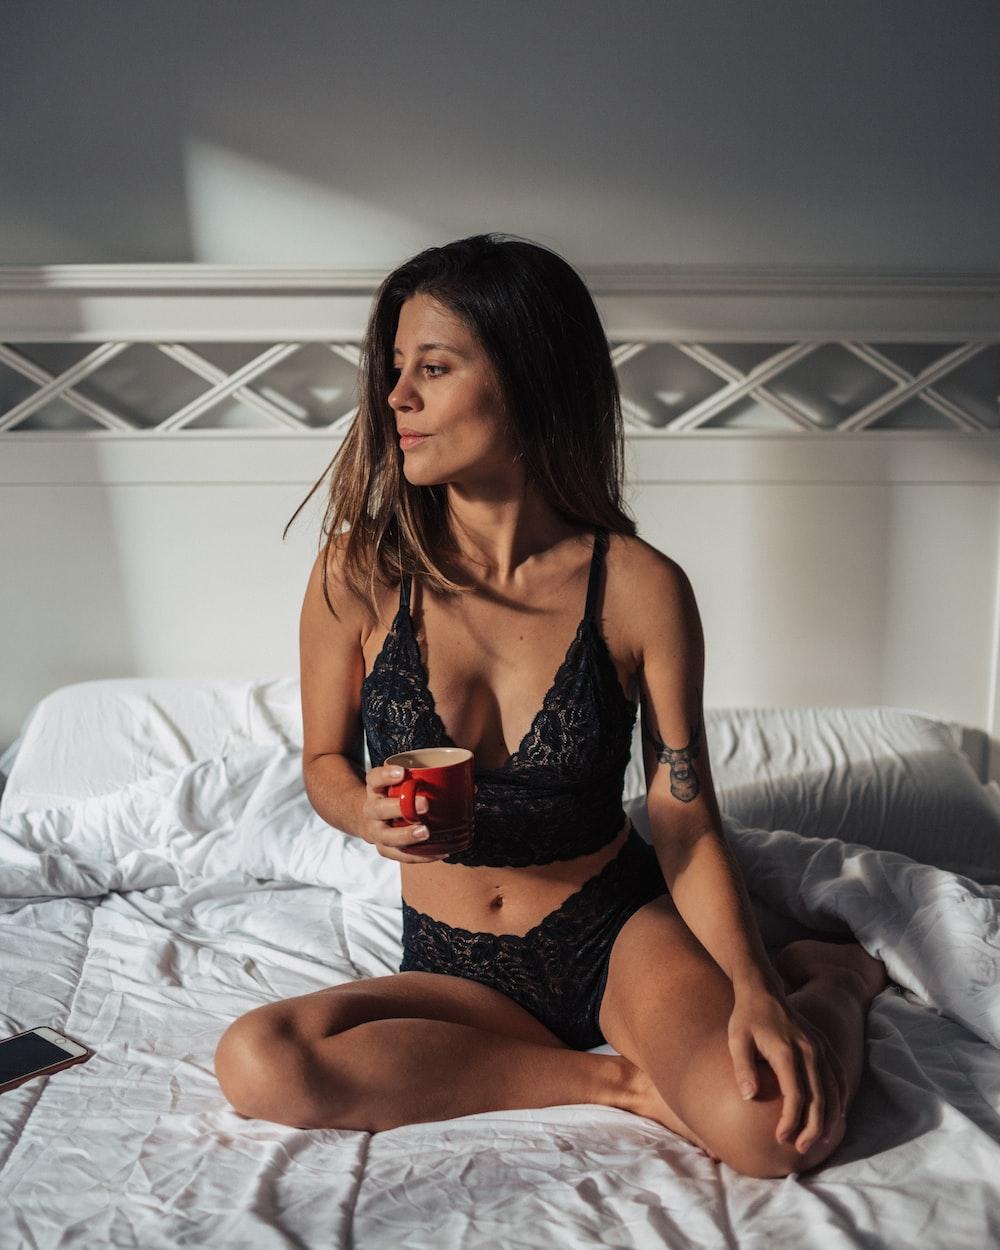 woman wearing black bra and panties sitting on bed